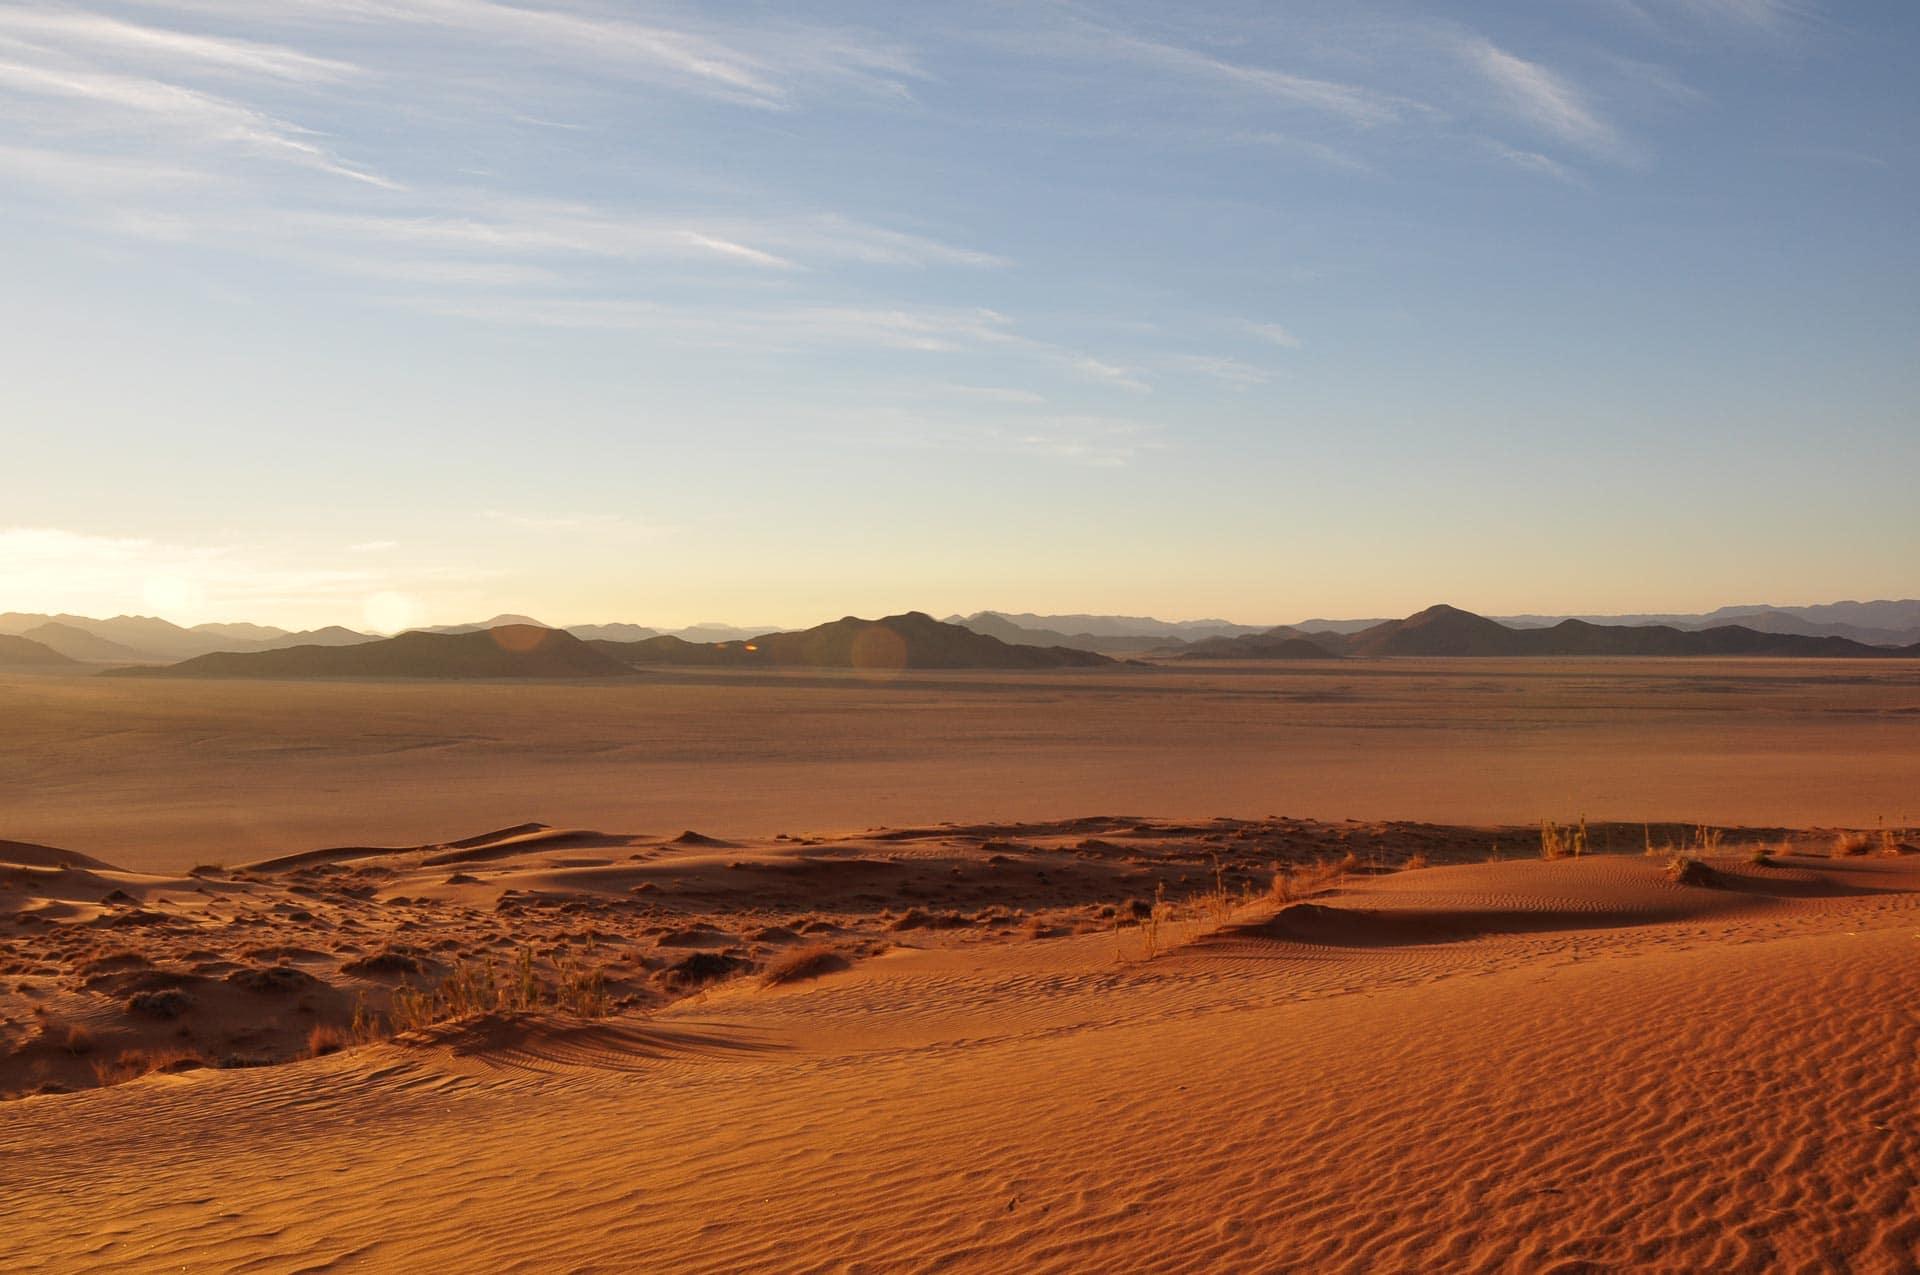 Kanaan-Desert-Retreat-Namibia-Globetrotter-Select-34